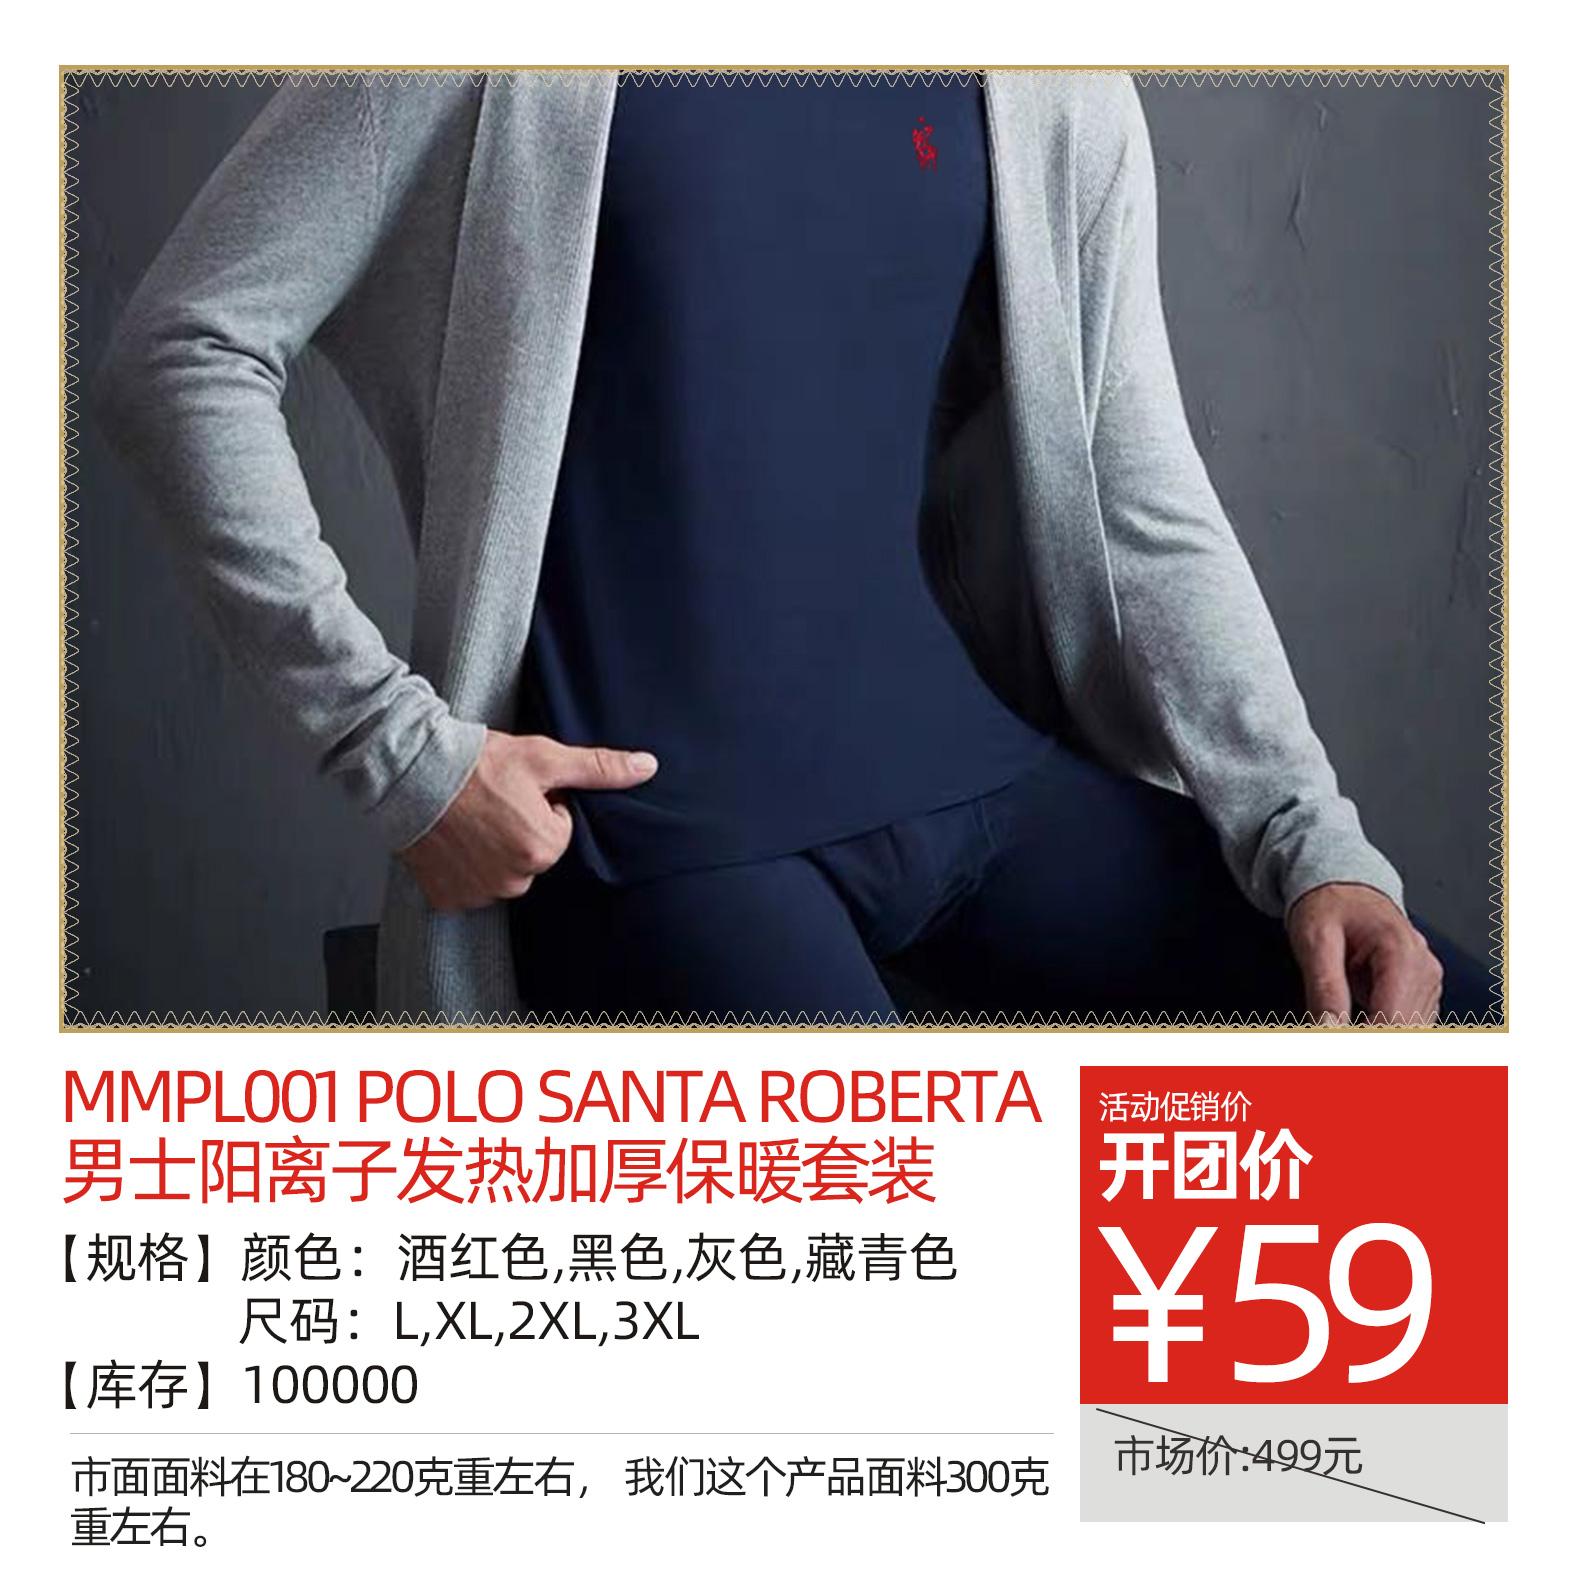 MMPL001 POLO SANTA ROBERTA男士阳离子发热加厚保暖套装